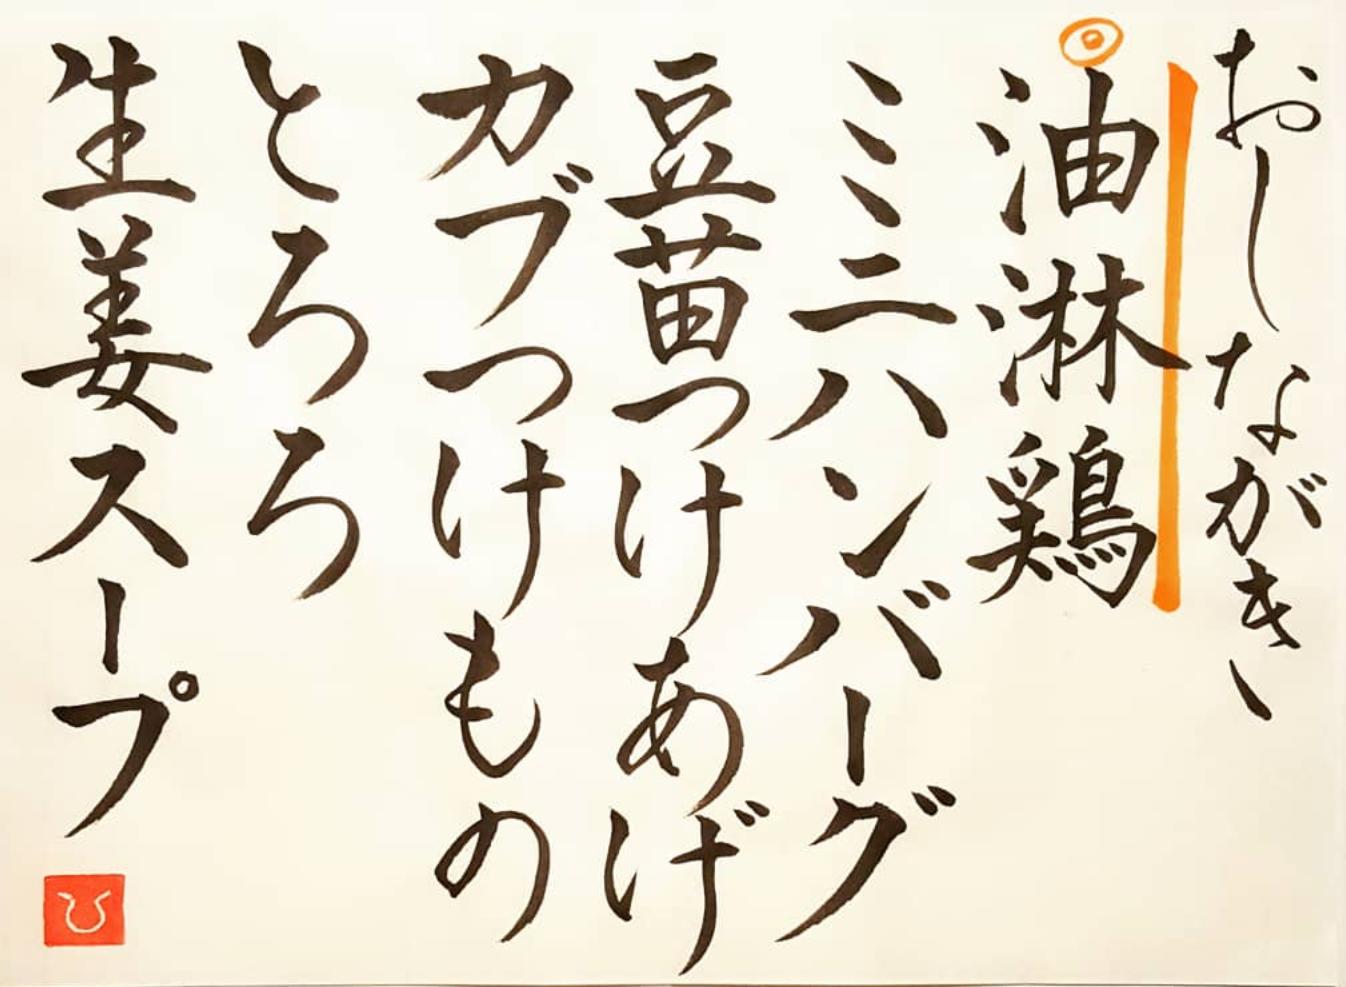 20201208-oshinagaki